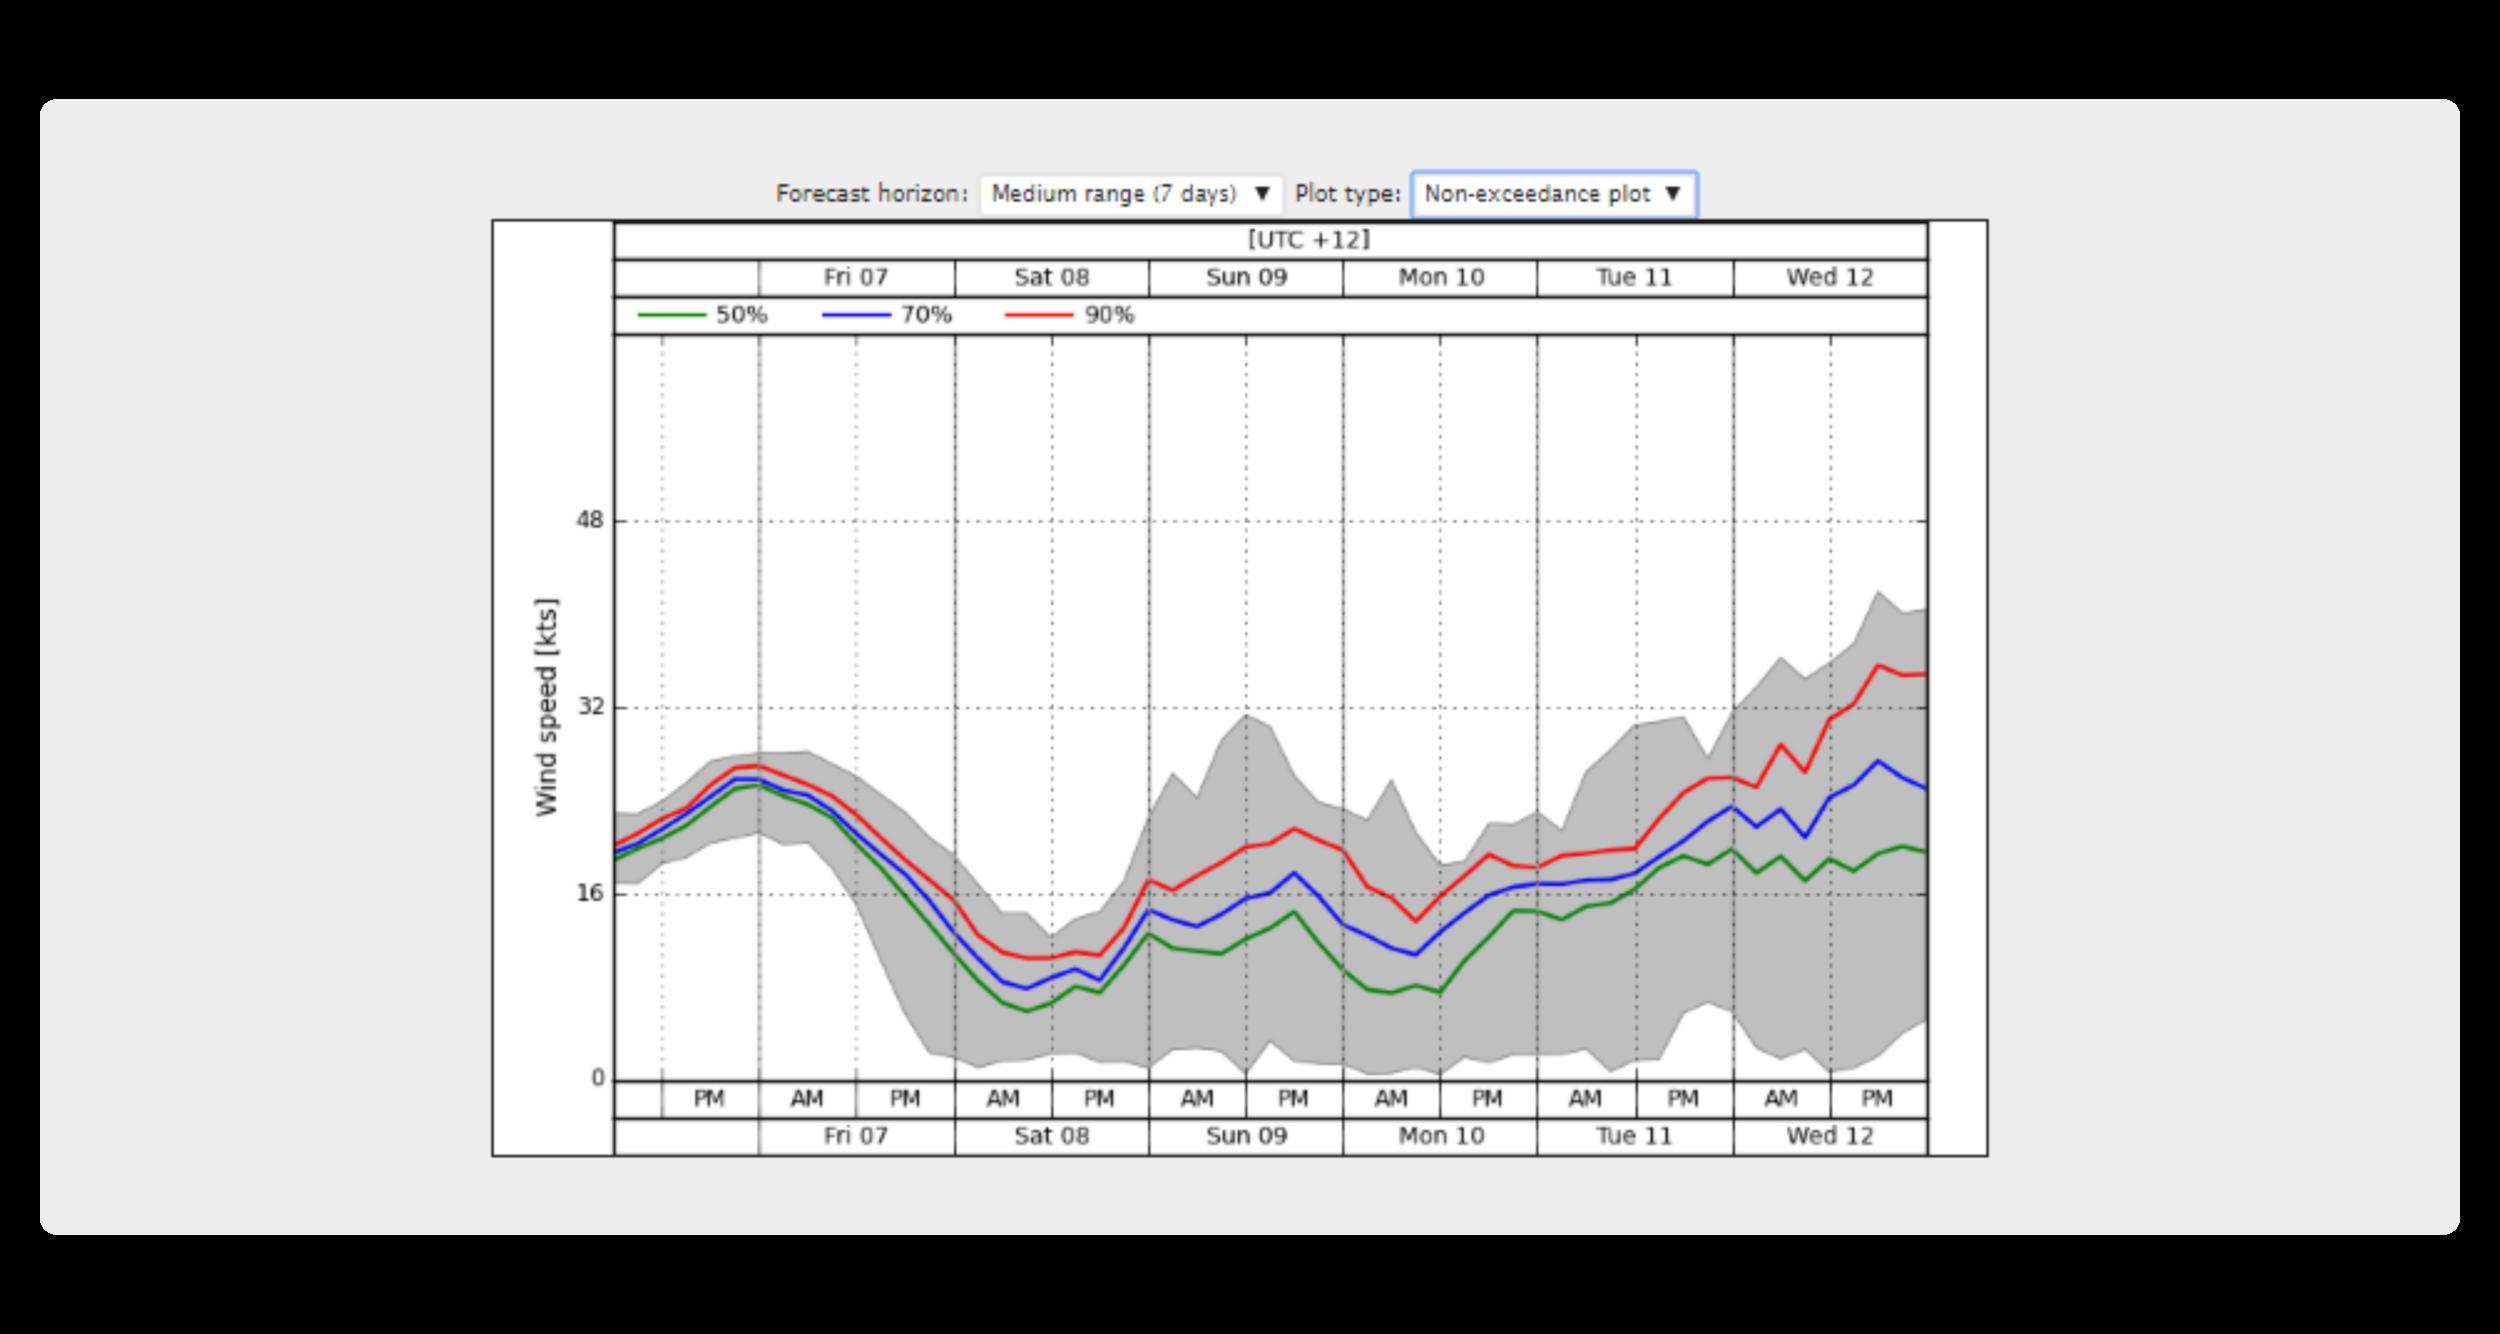 Site-specific forecast: probabilistic ensemble (non-exceedance plot)